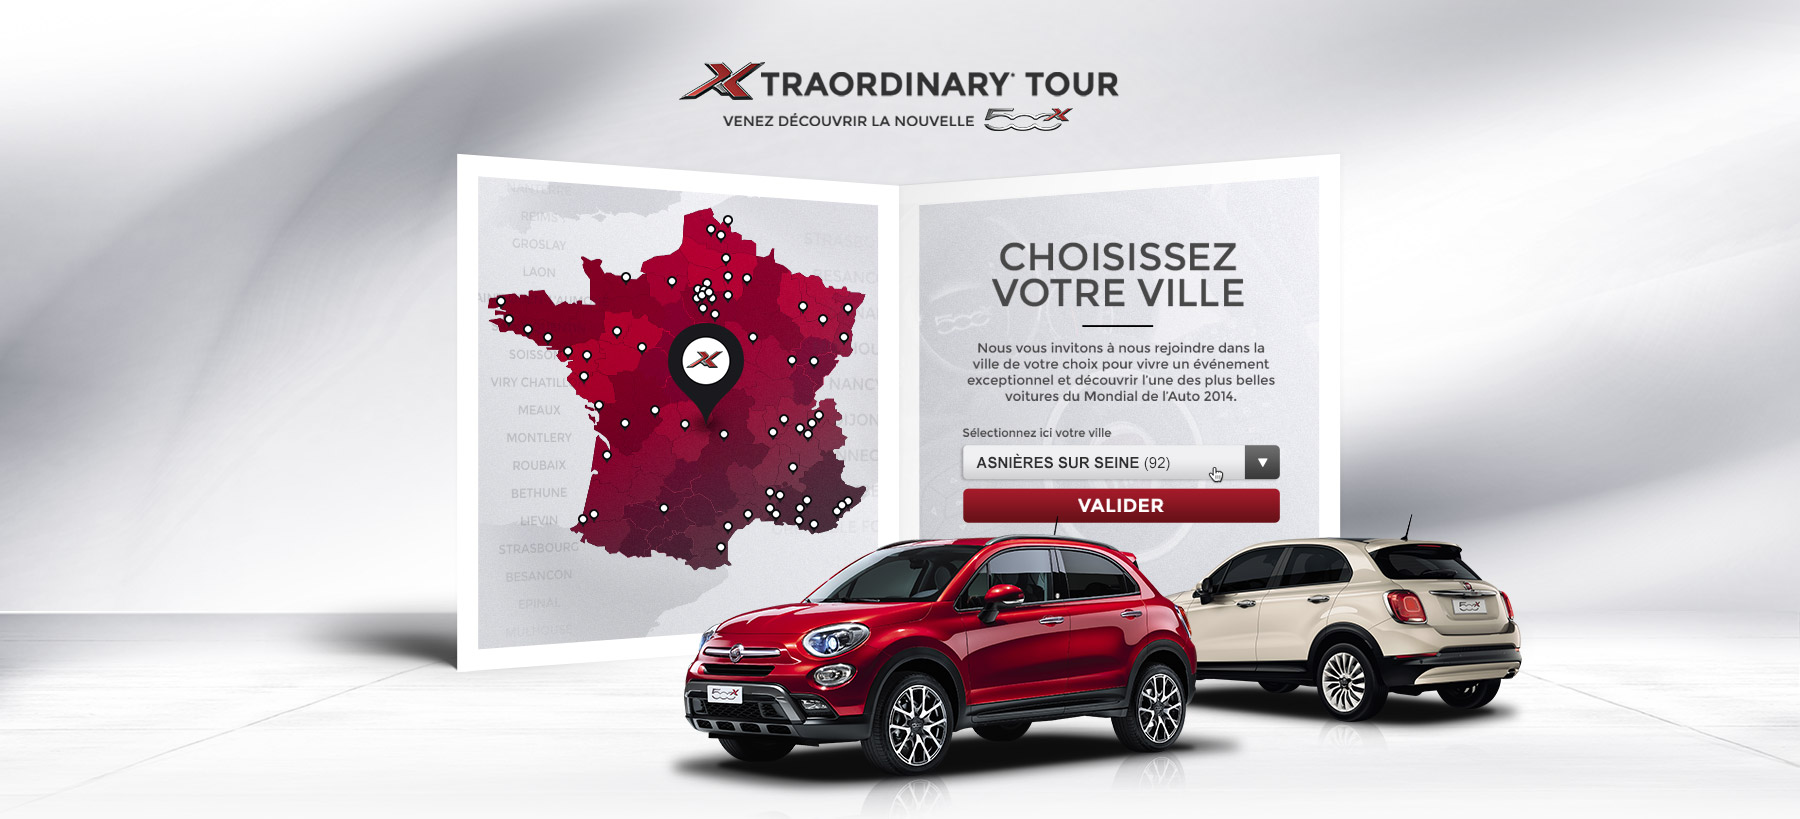 Directeur artistique freelance Portfolio Paris - FIAT 500X